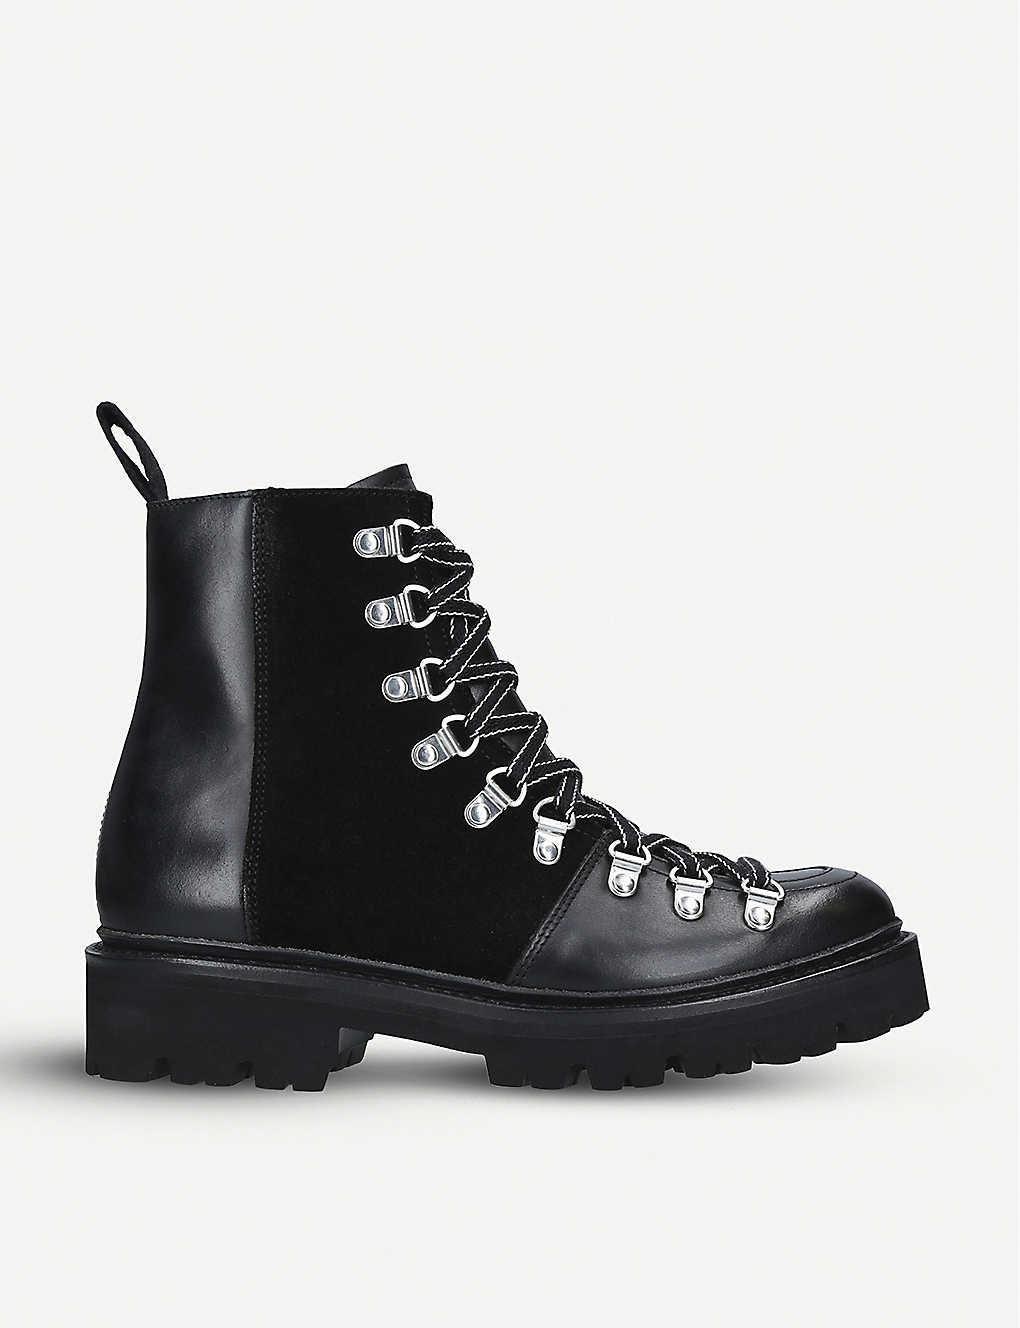 93c7f470470 GRENSON - Nanette leather hiking boots | Selfridges.com